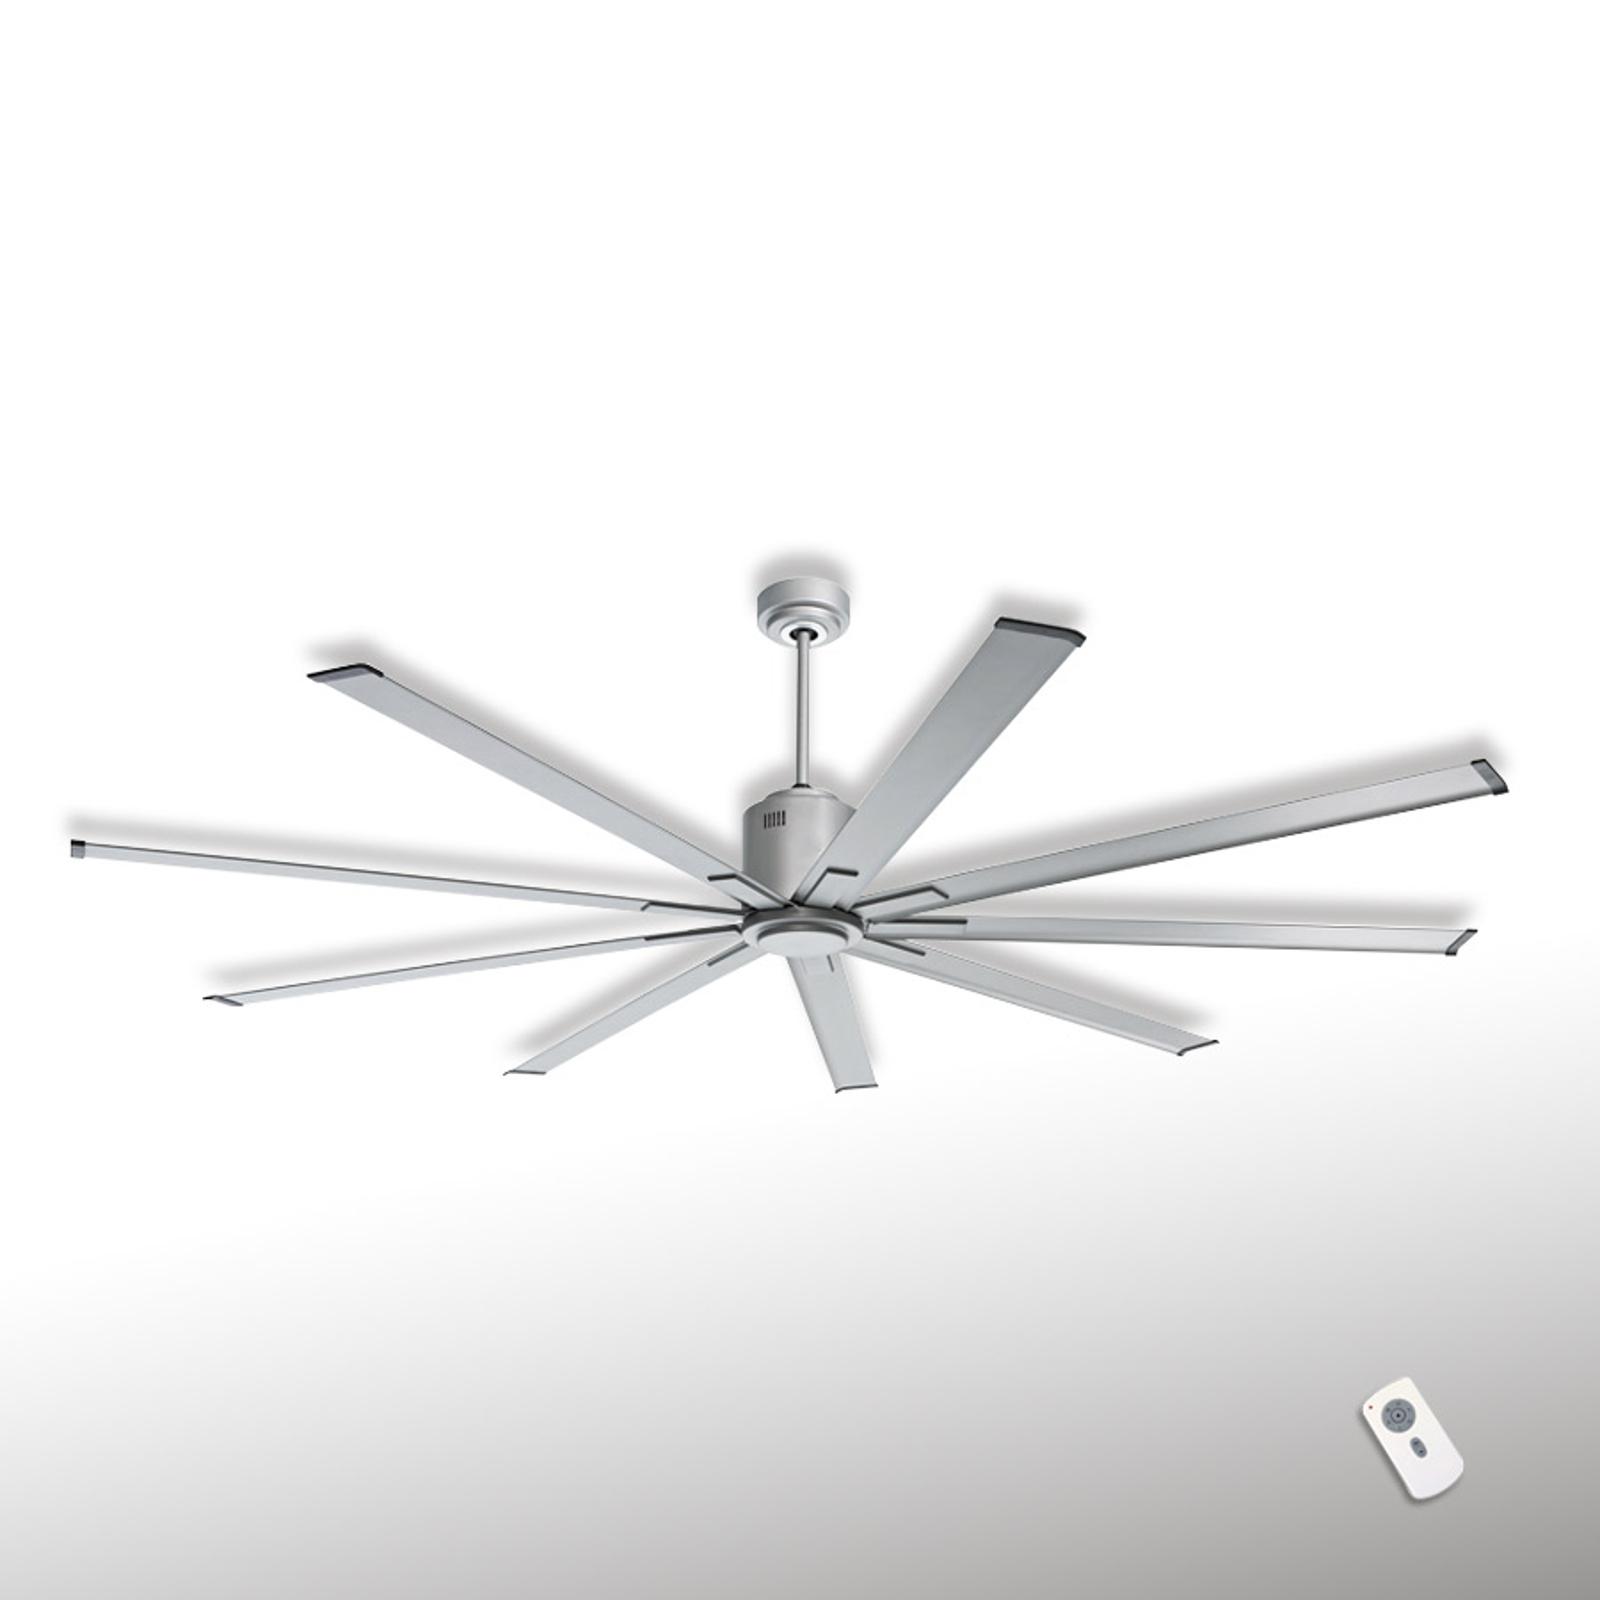 Stropní ventilátor Big Smooth Eco 220 cm